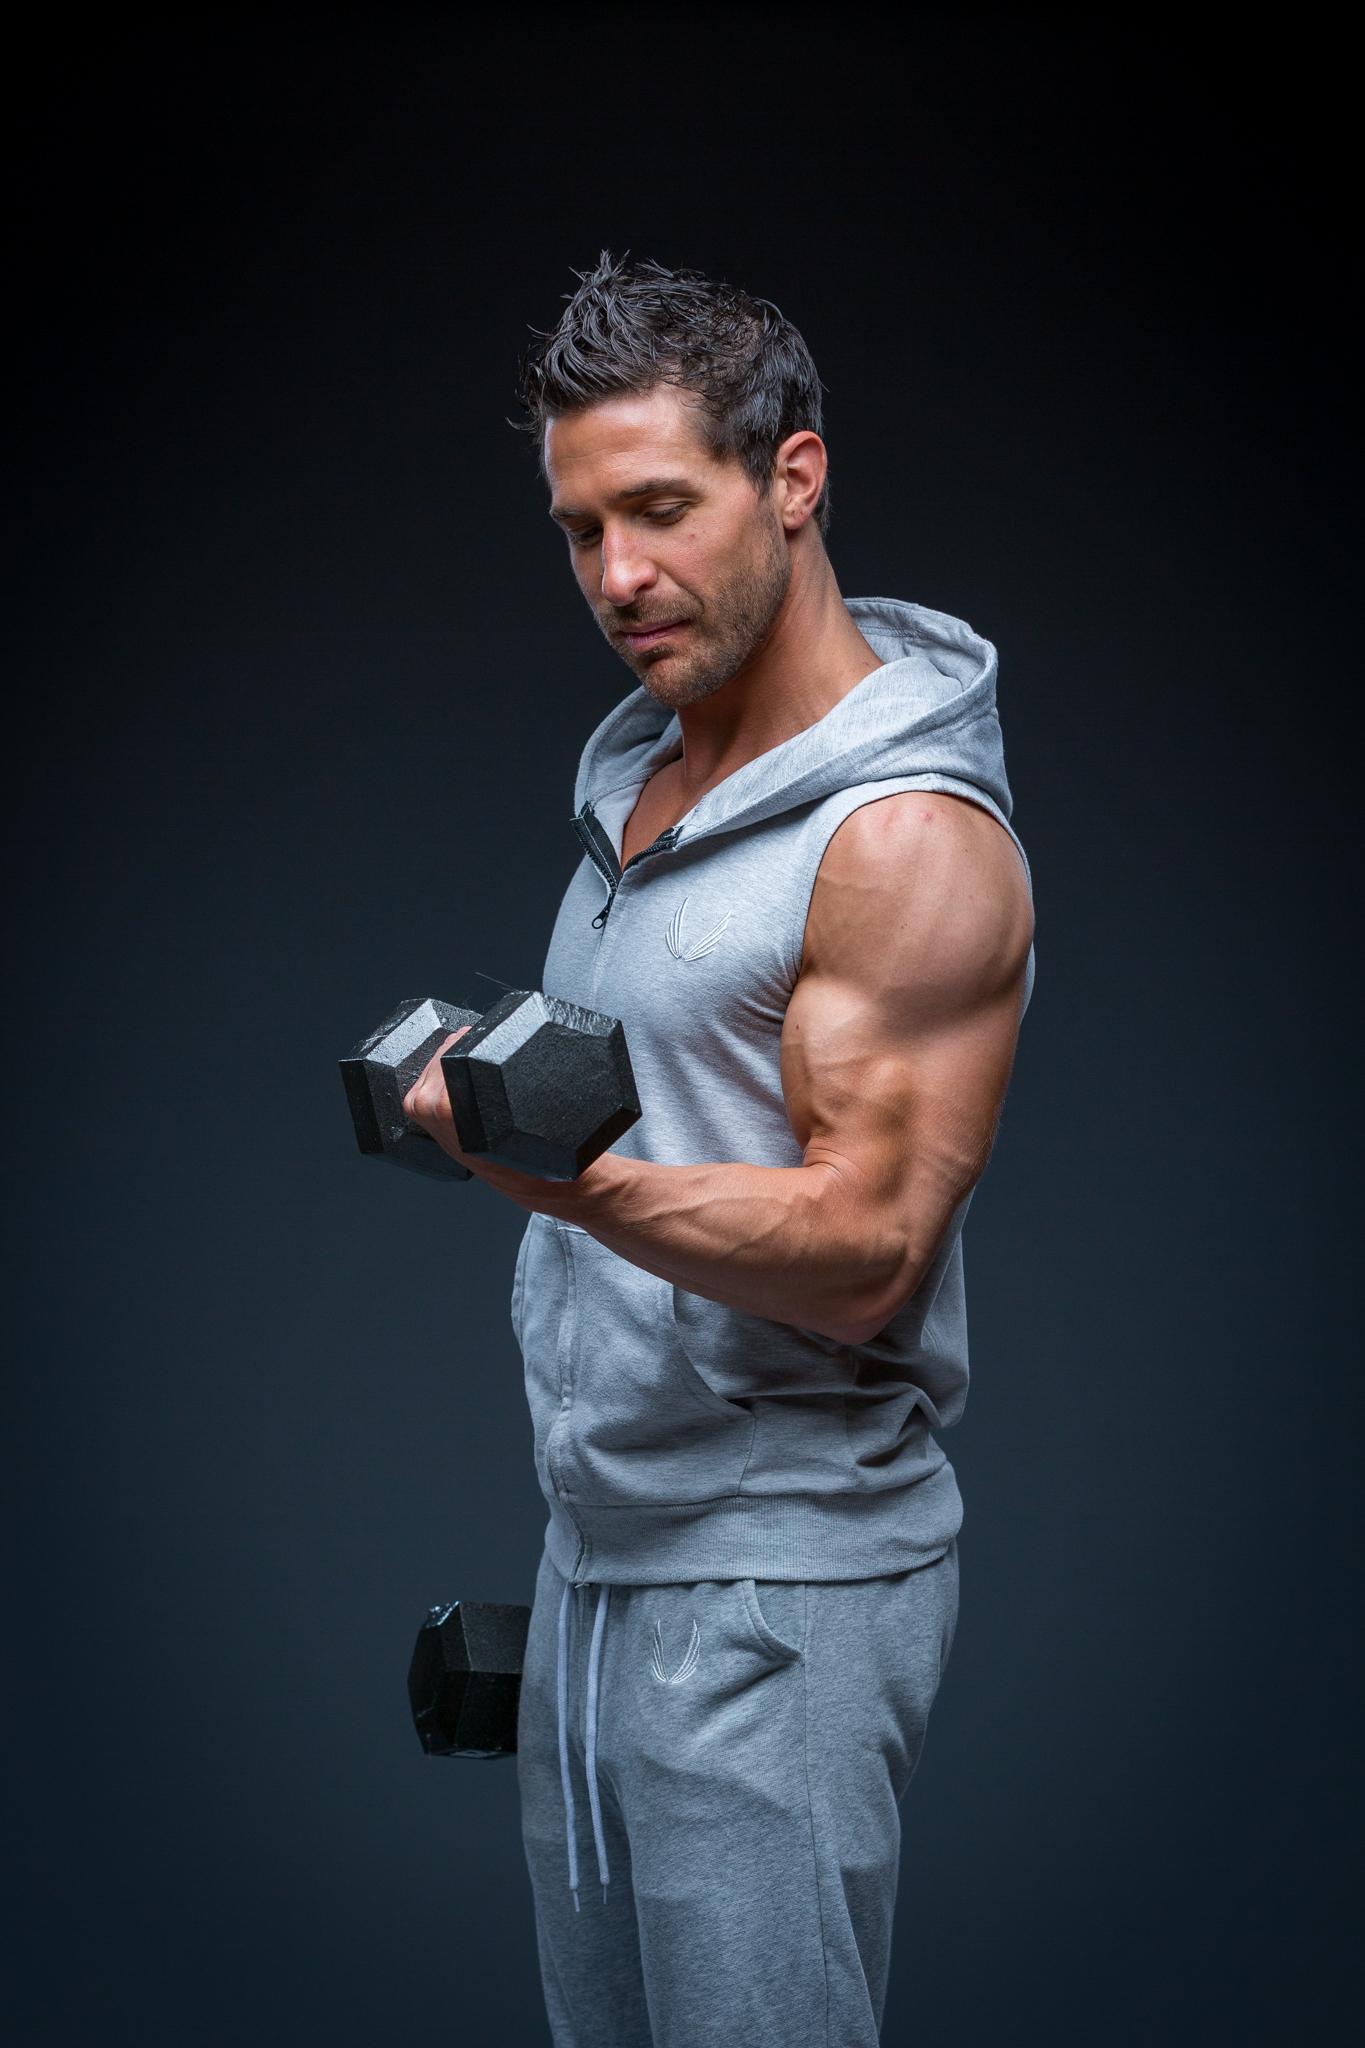 fitness-photographer-dover-new-hampshire-npc-boston-keeley.jpg